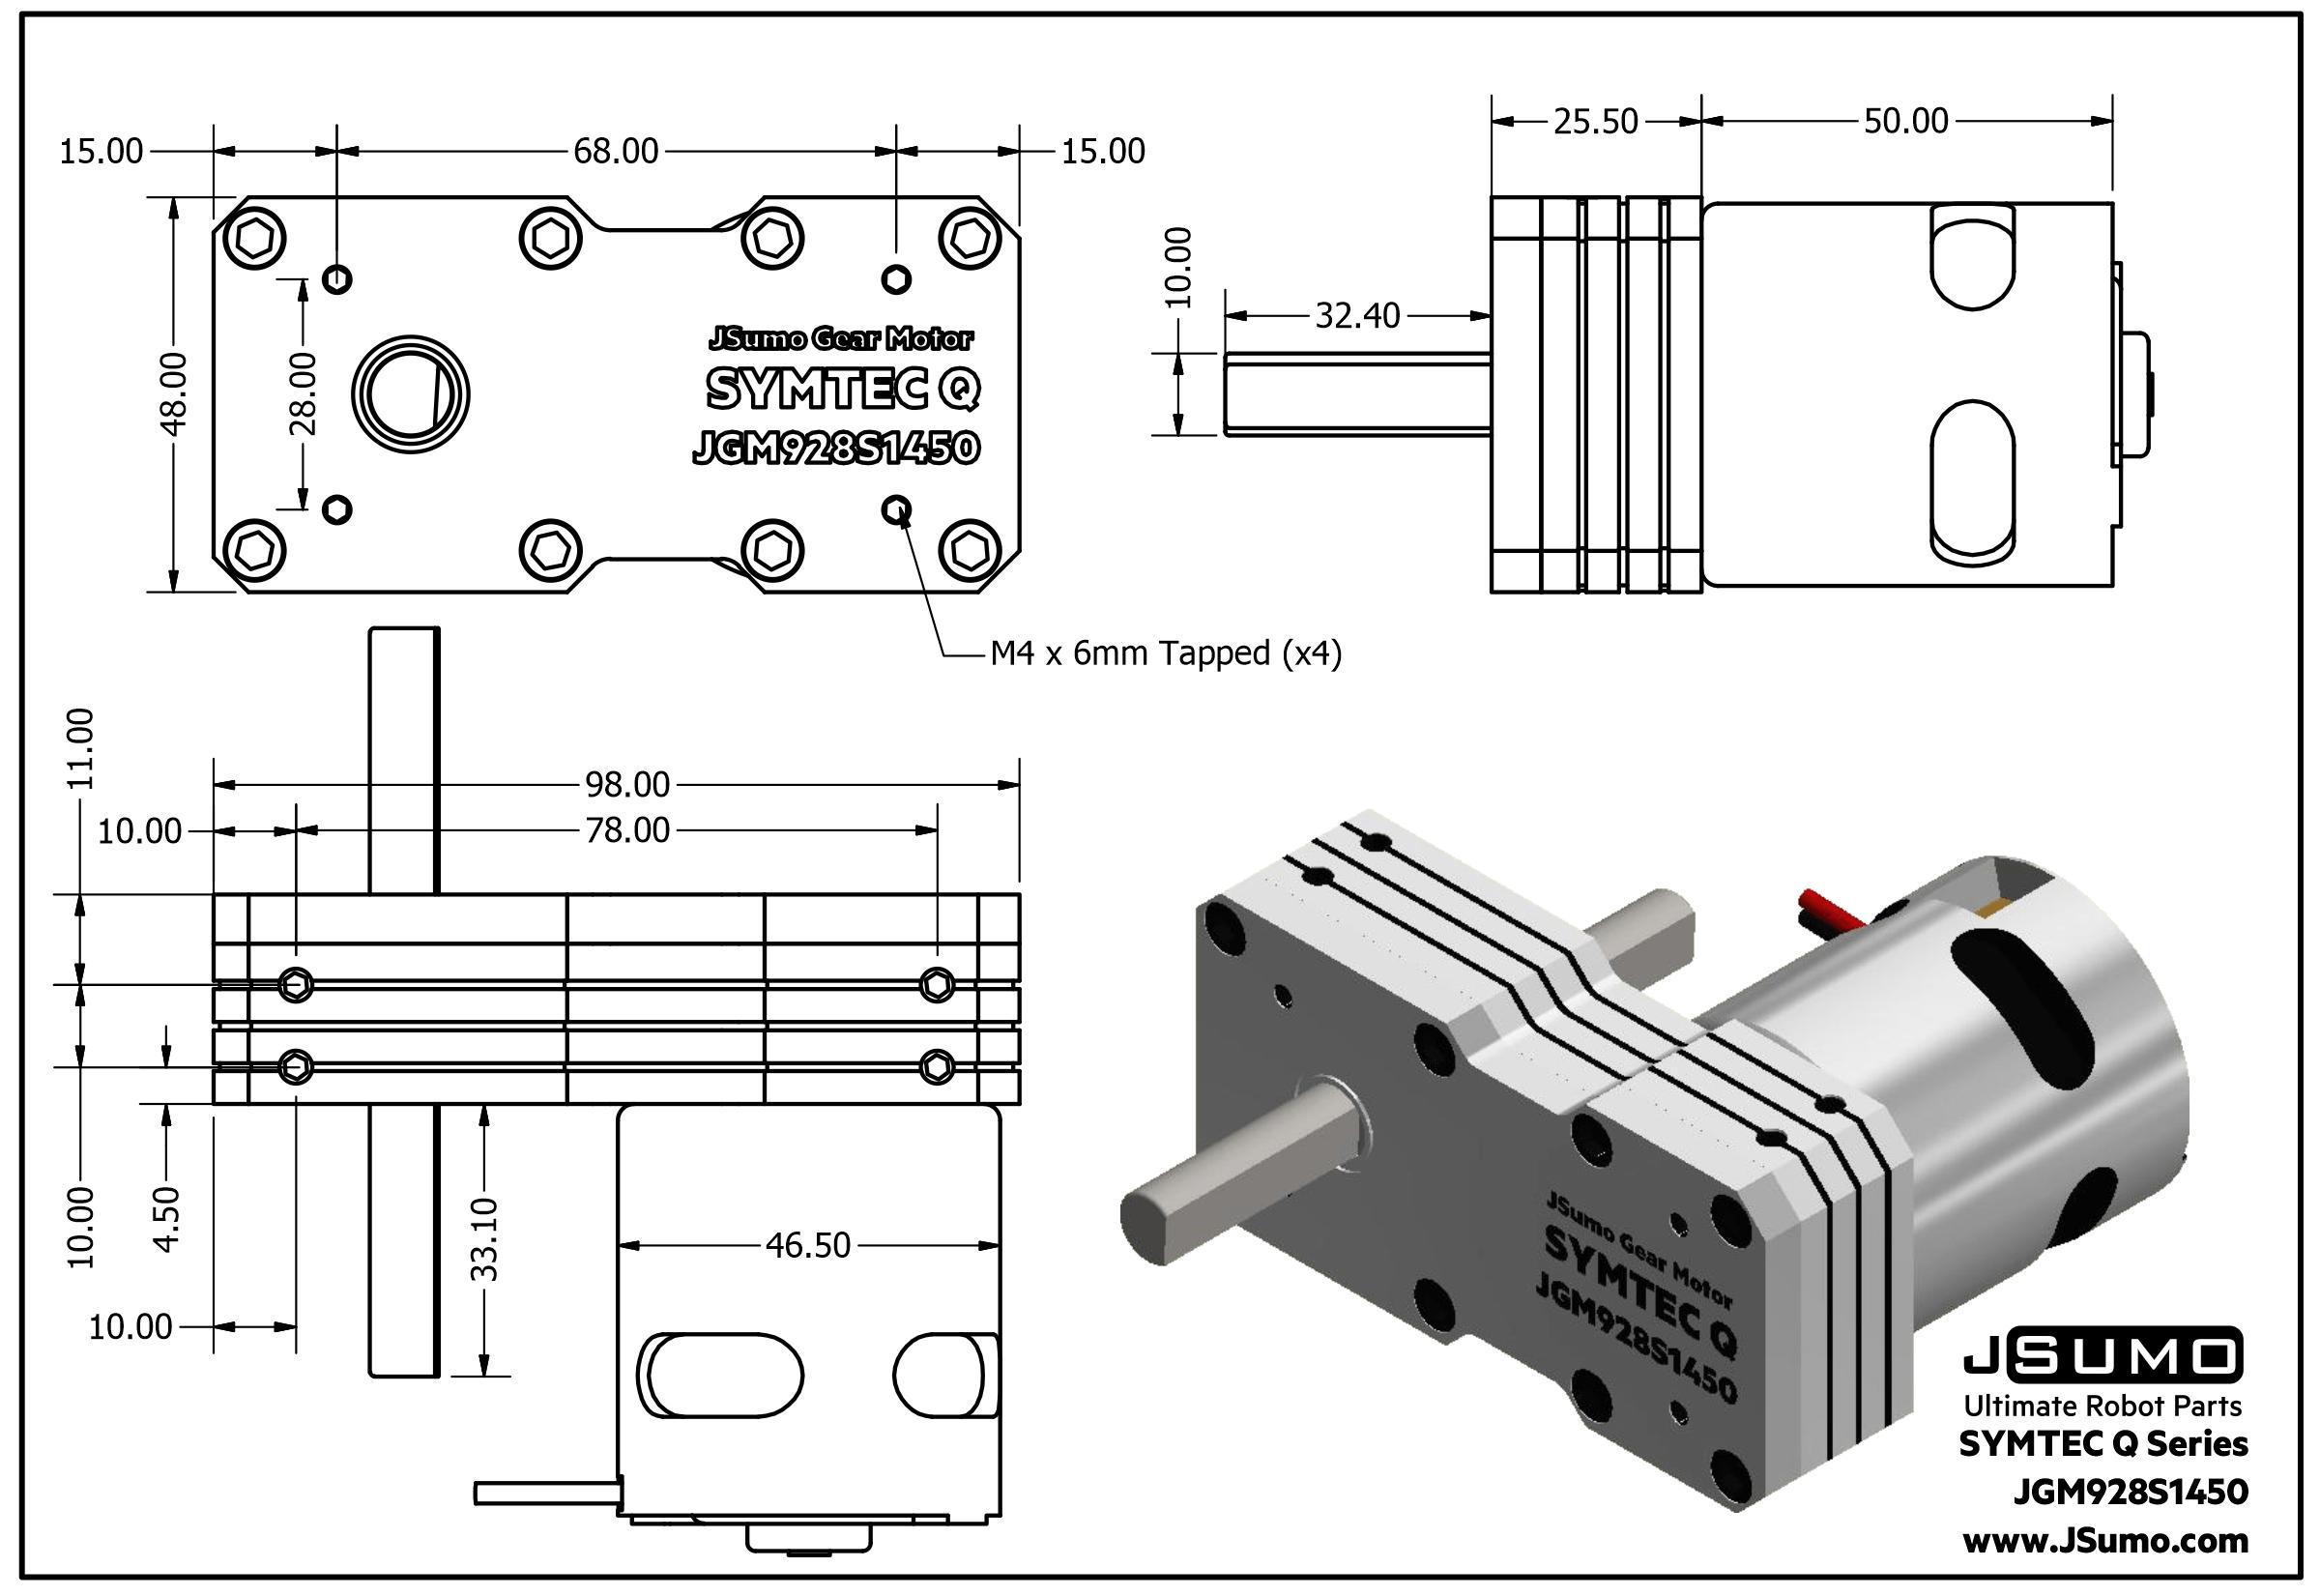 Symtec Q Gearmotor (12V 1450 RPM 9.28:1 44 Kgcm)